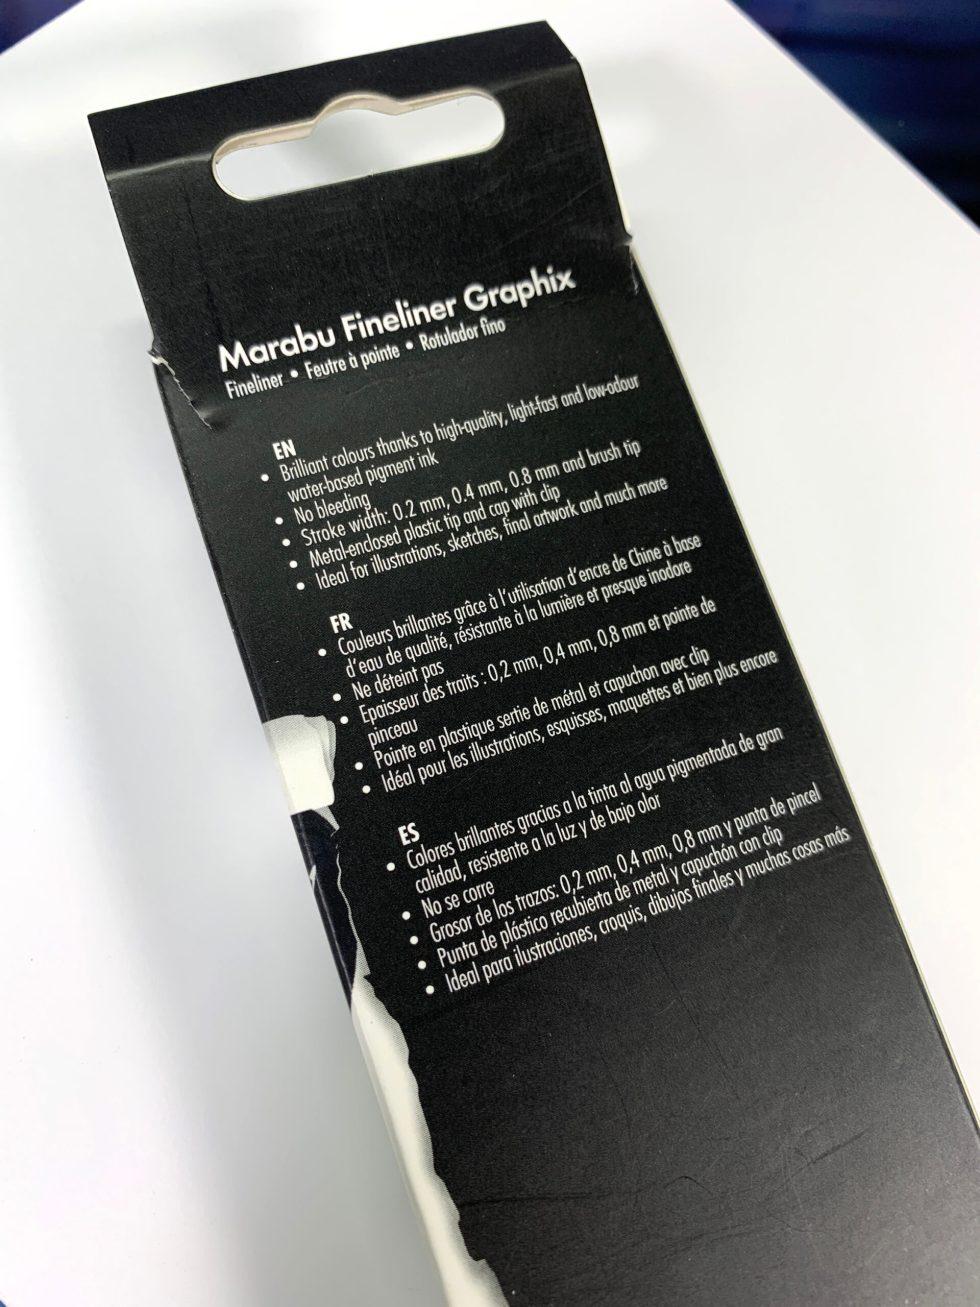 Marabu Fineliner Graphix Pens image 4